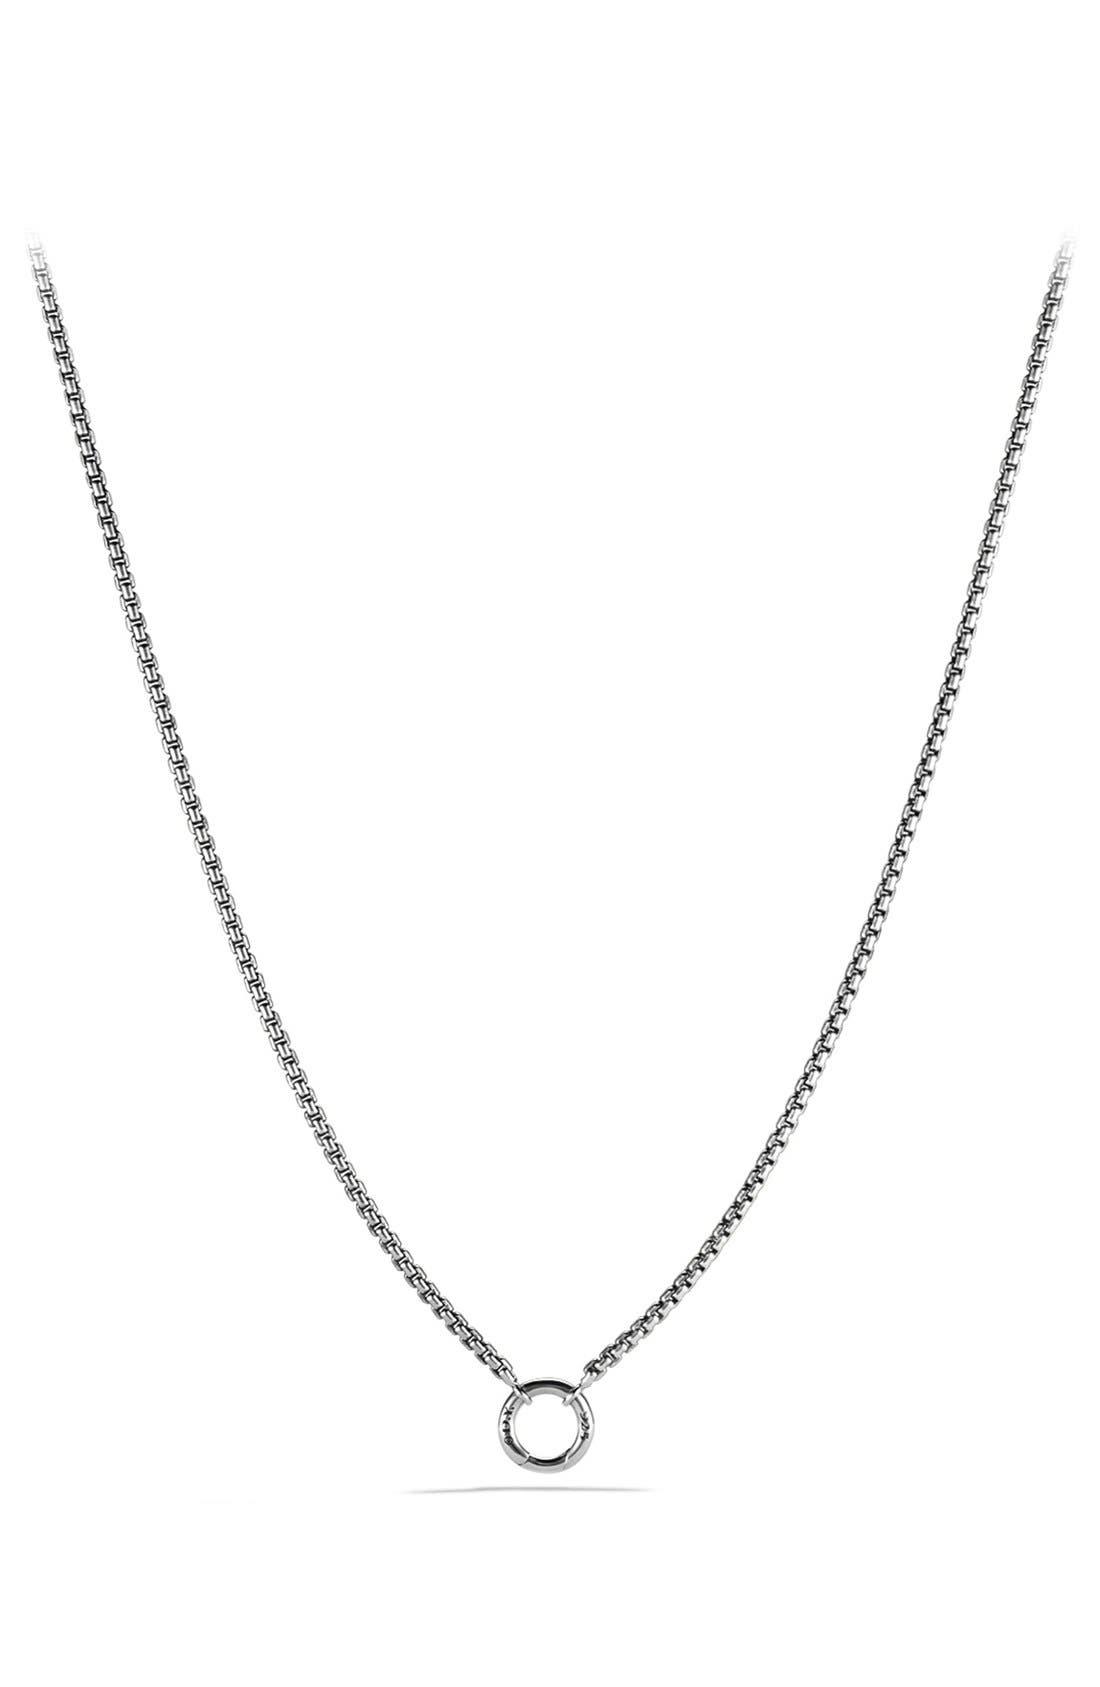 Alternate Image 3  - David Yurman 'Chain' Charm Chain Necklace